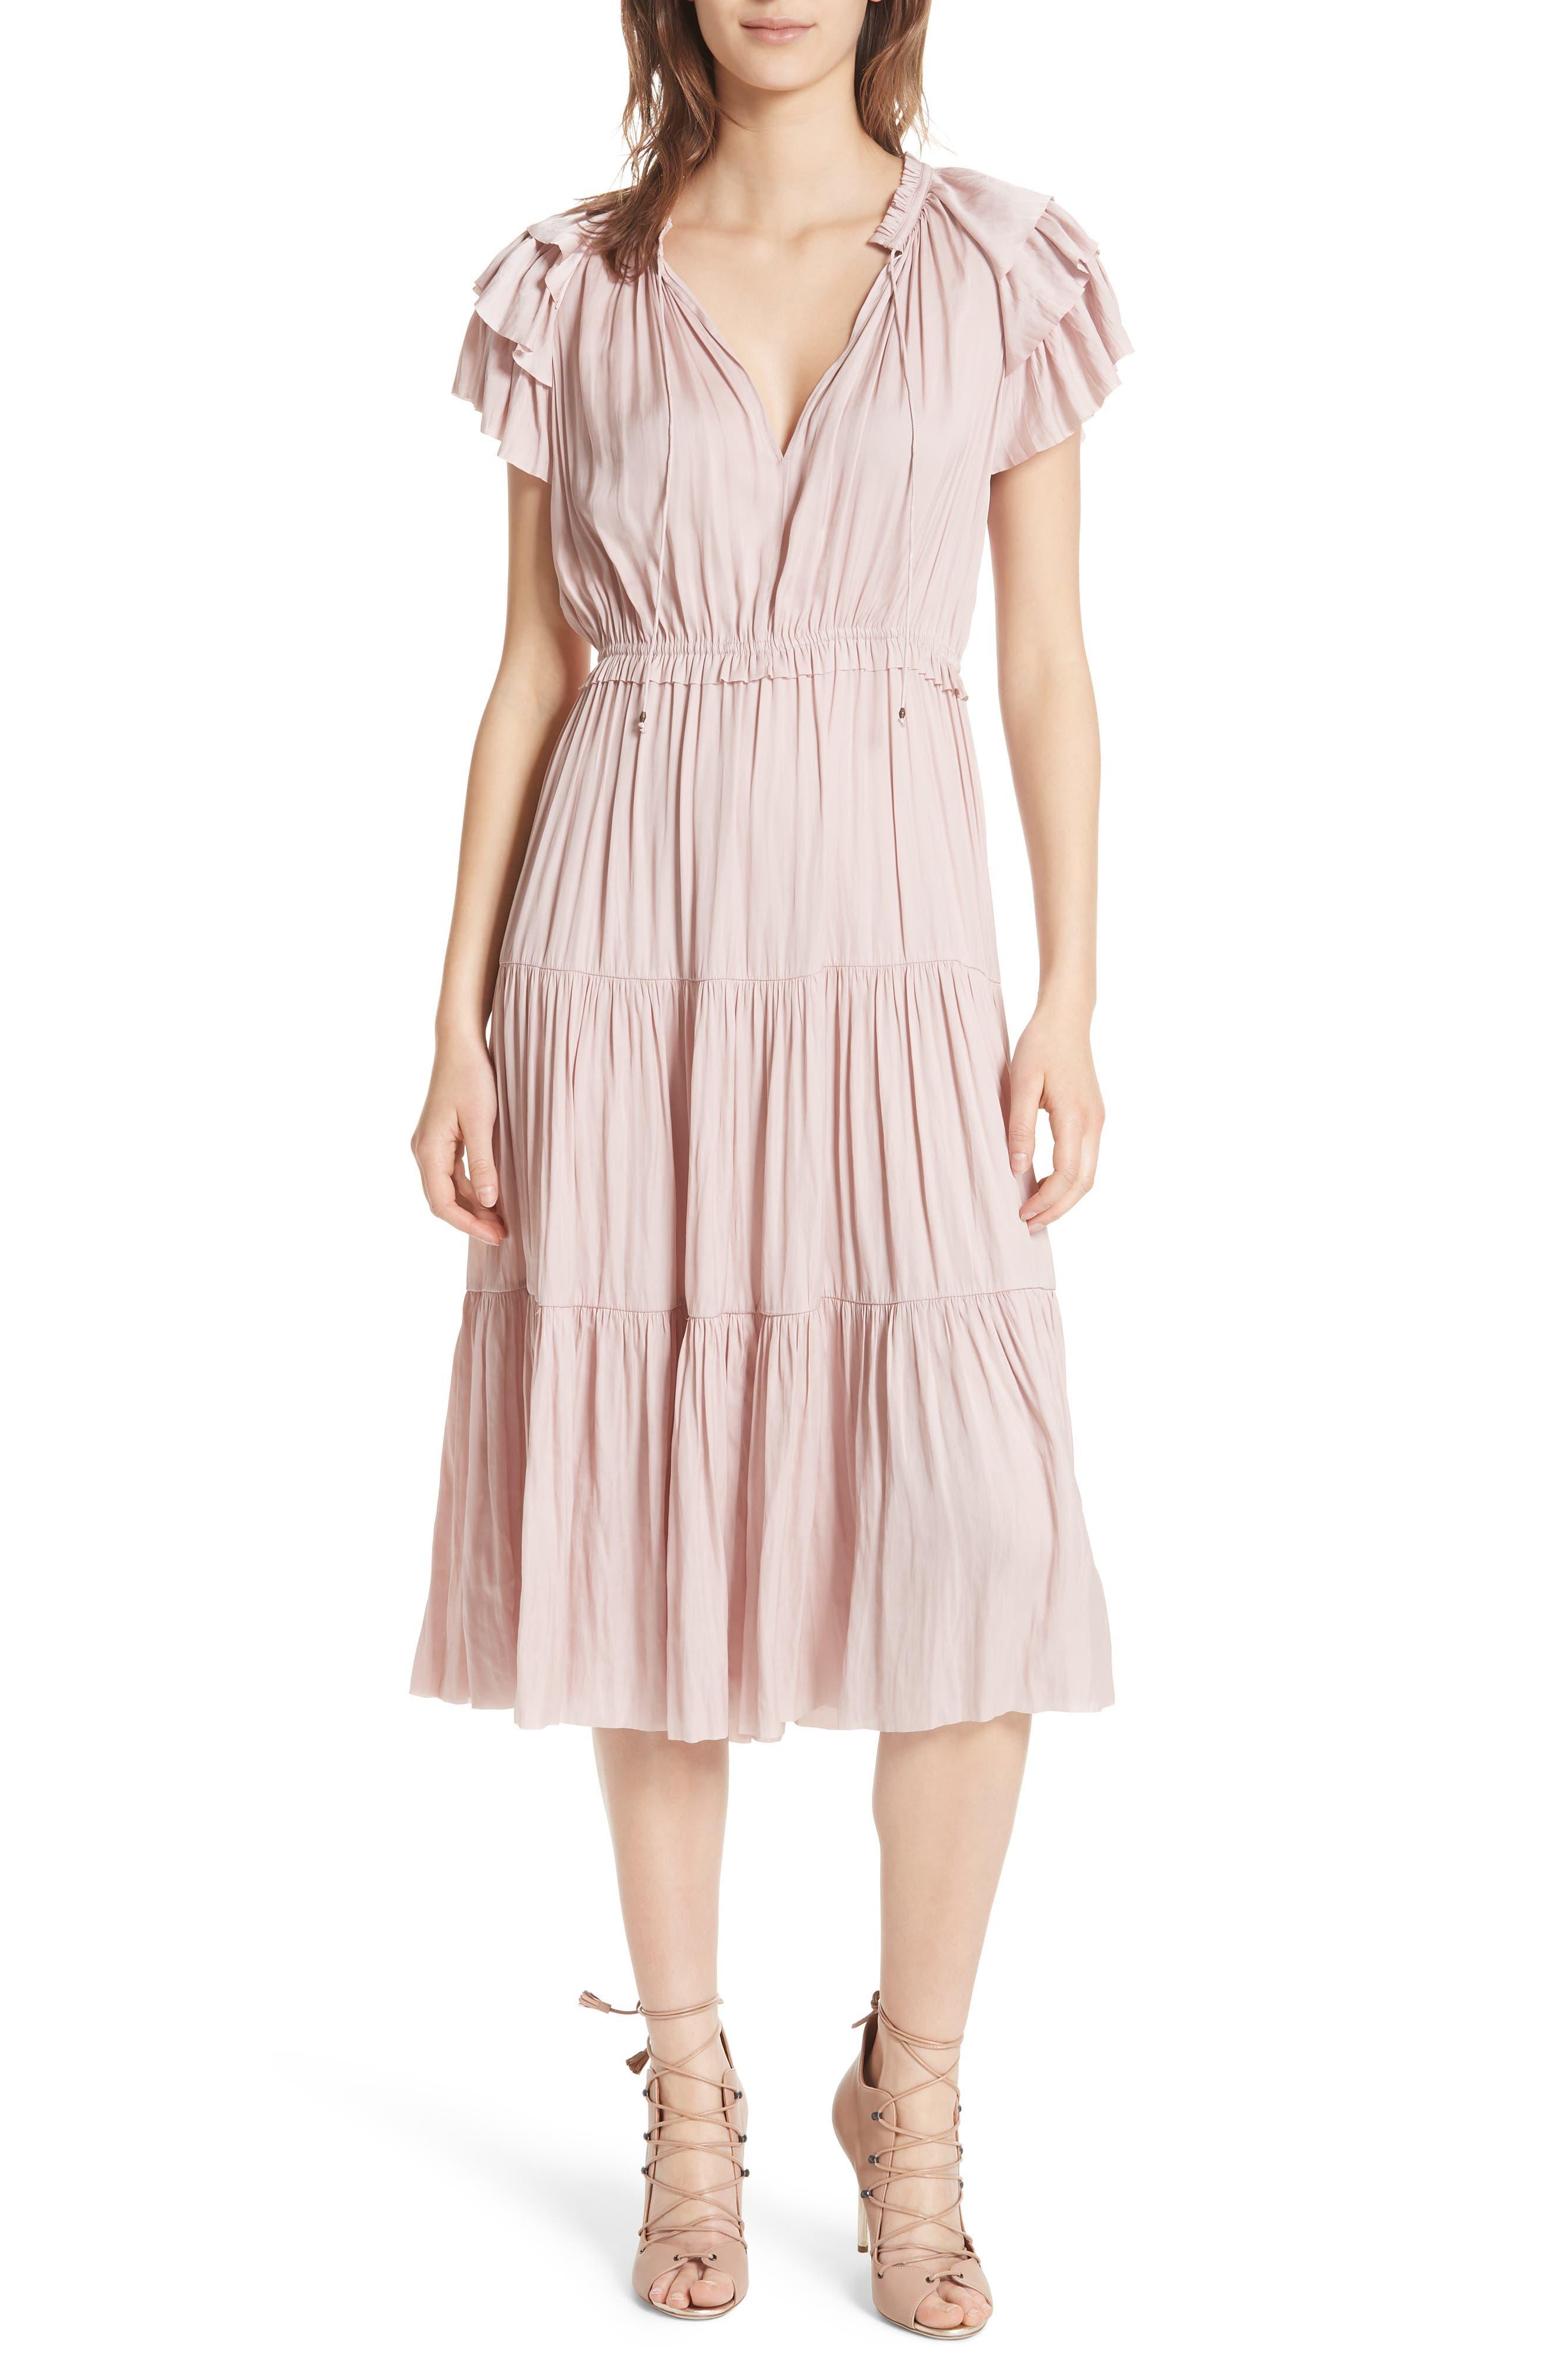 ULLA JOHNSON Blaire Satin Dress, Main, color, 600